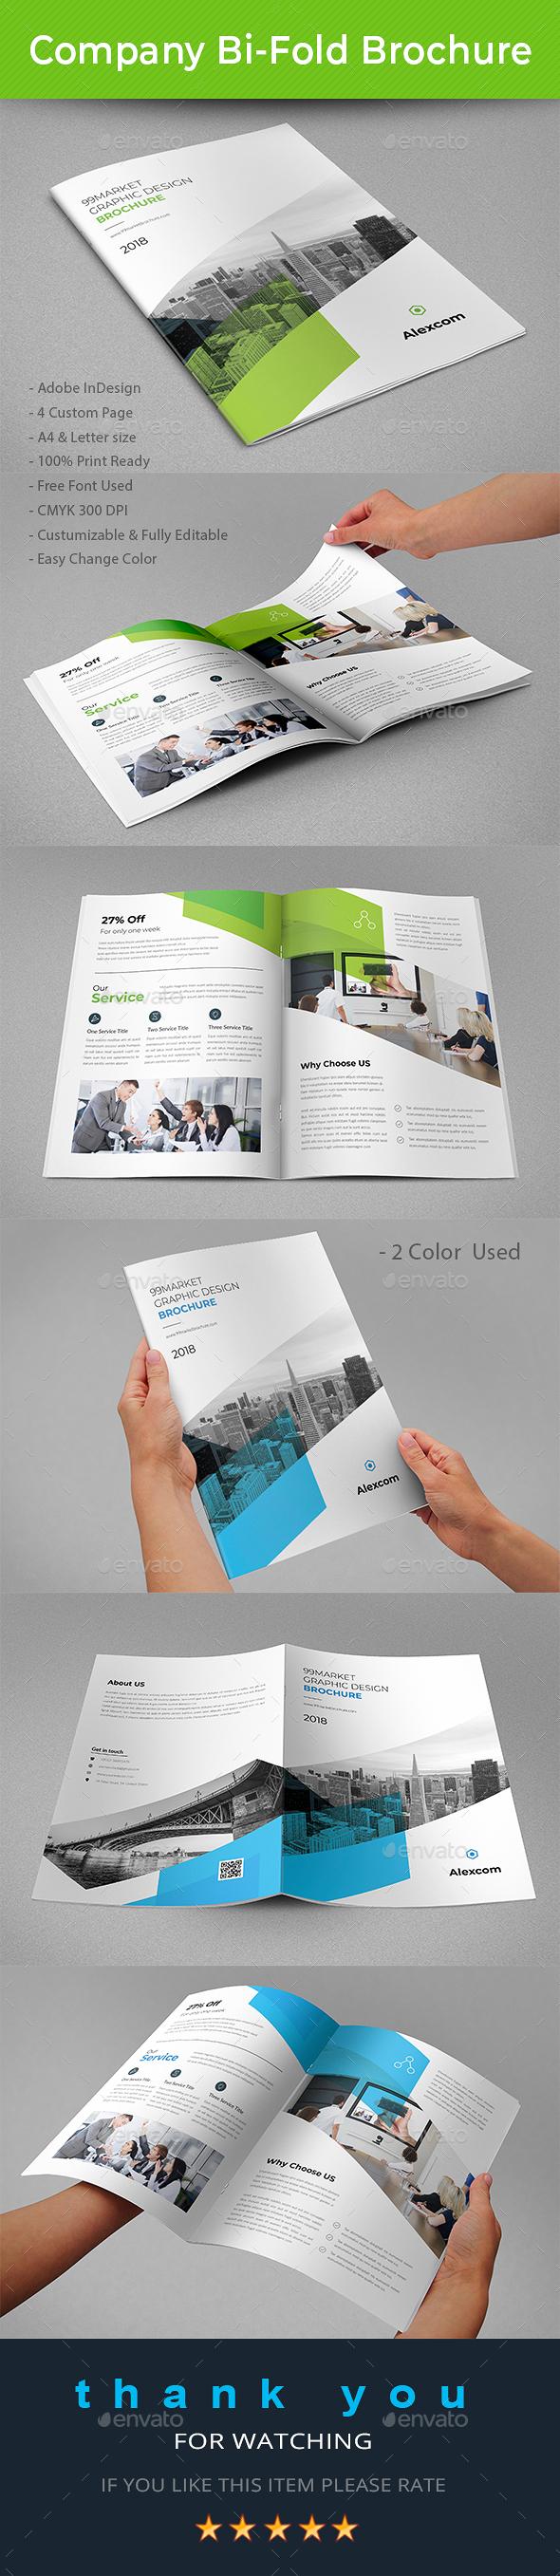 Company Bi-Fold Brochure - Brochures Print Templates